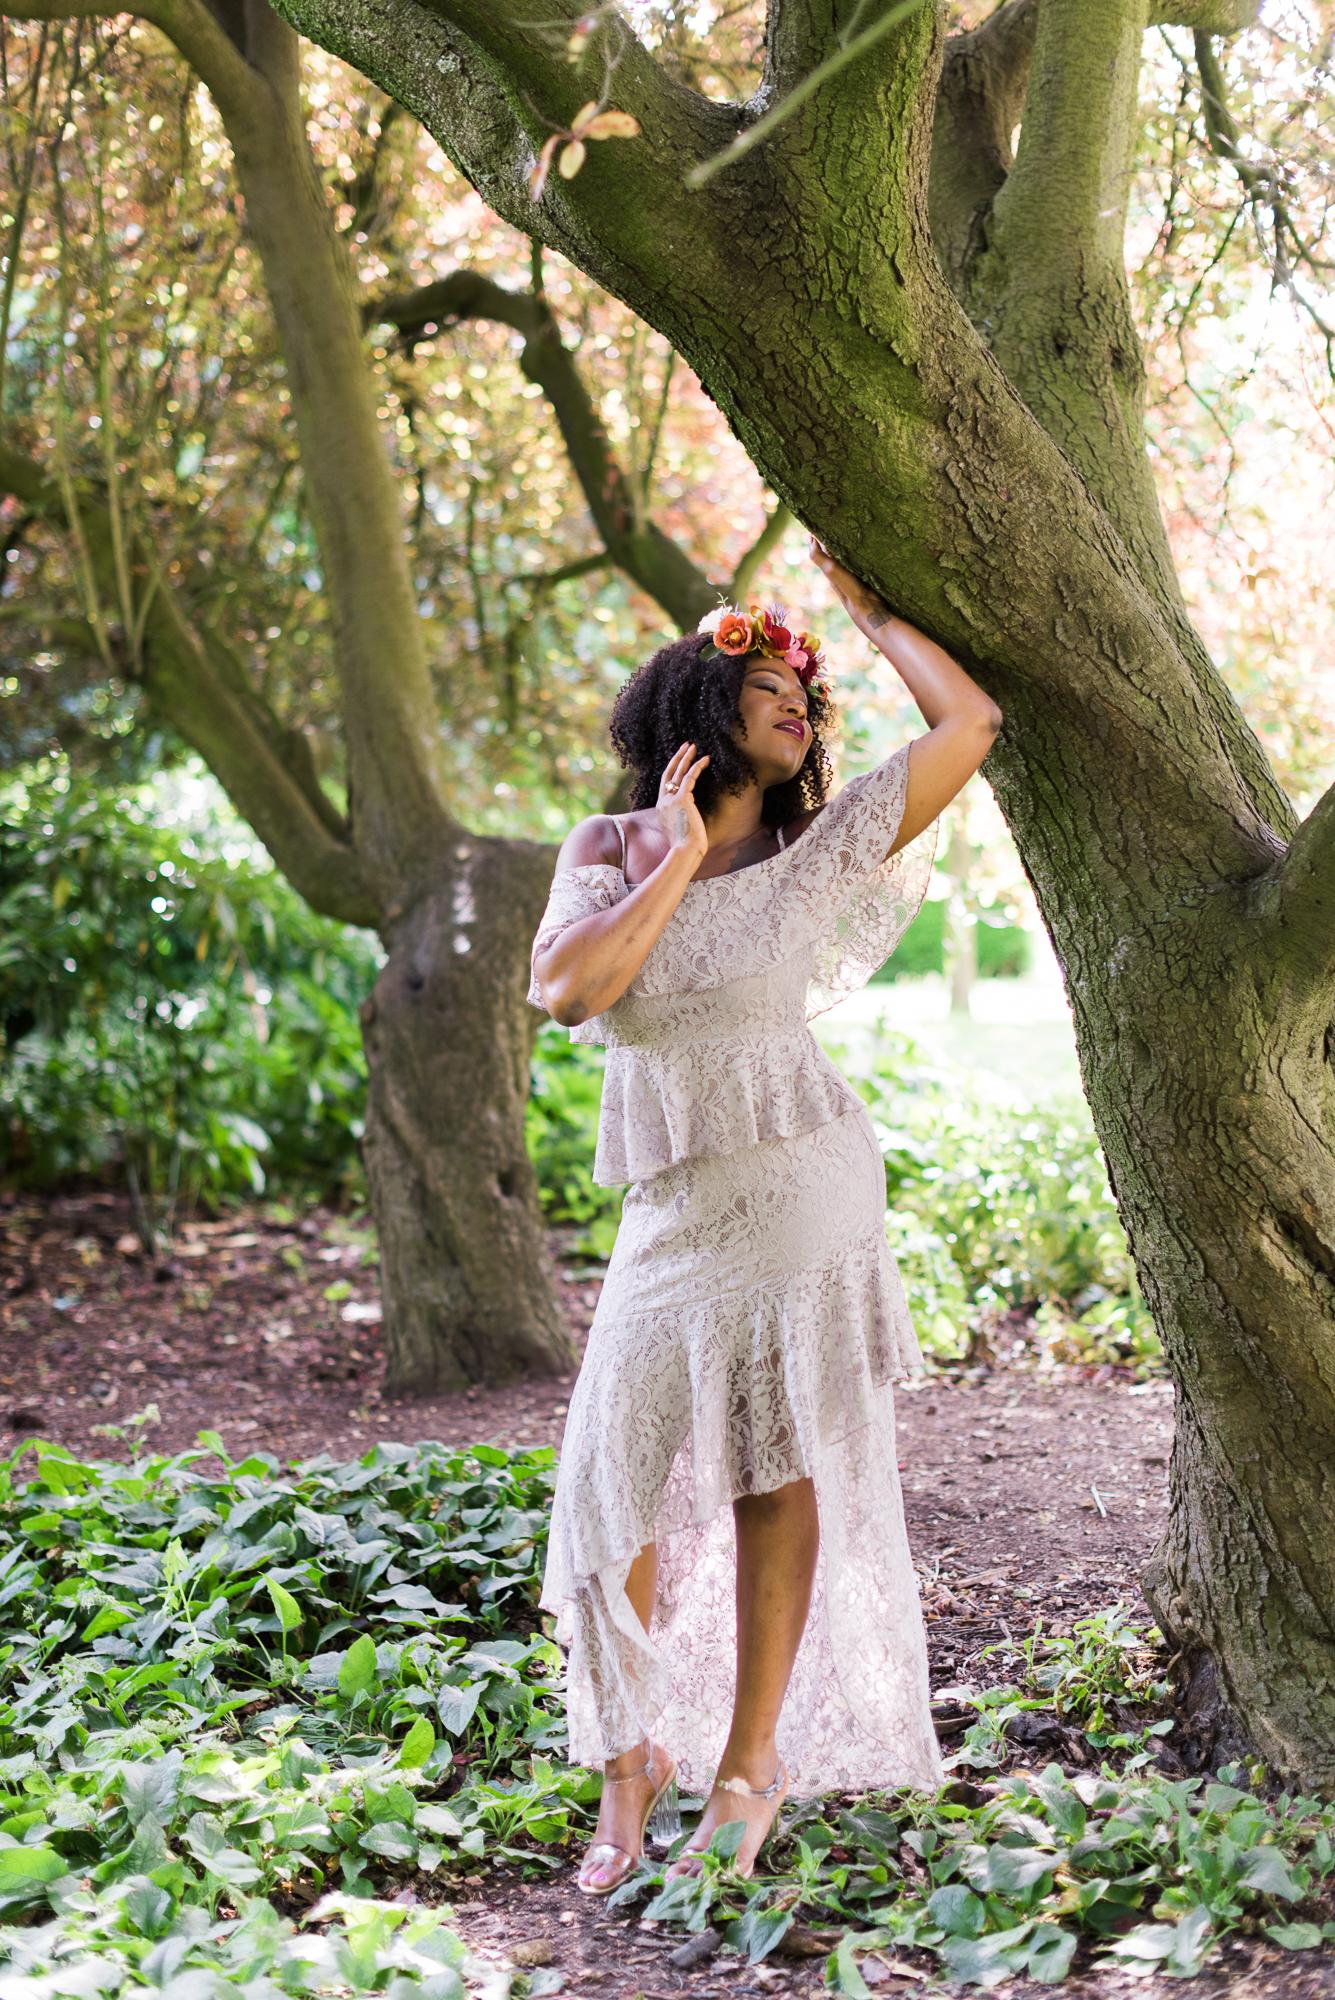 Joyce Oladipo Becky Rui Personal Branding Photographer-009.jpg